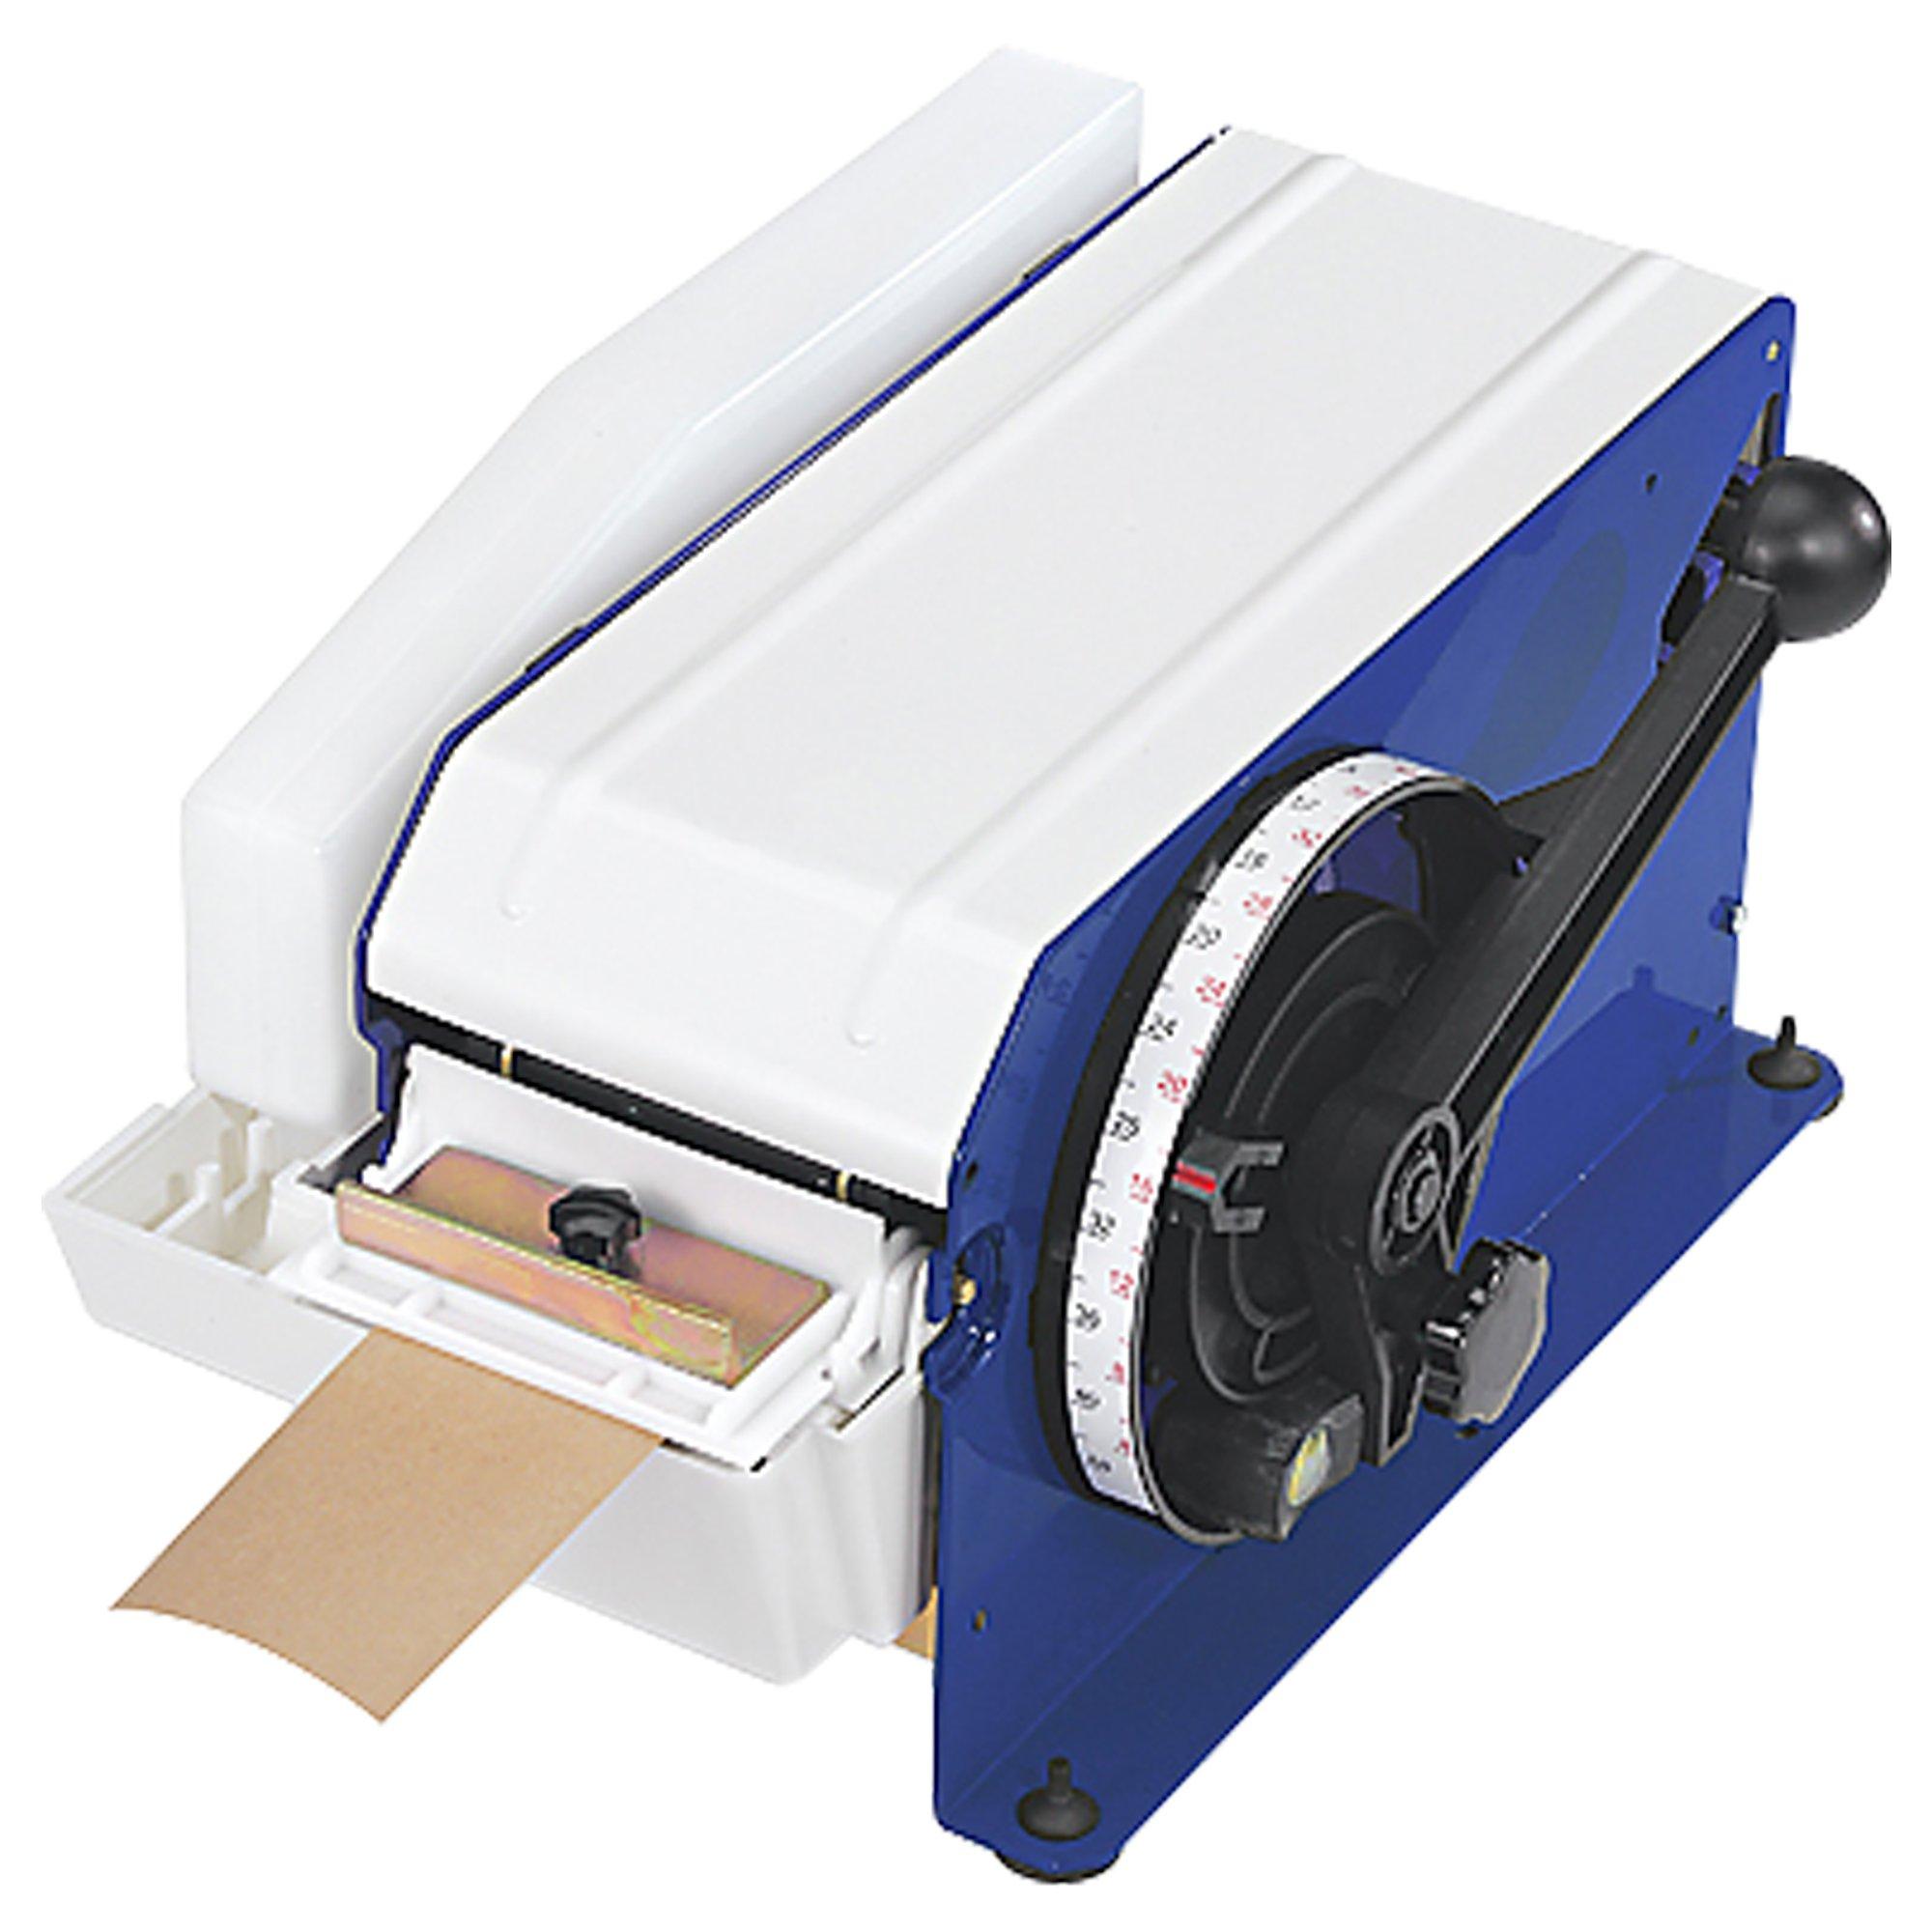 Partners Brand Tape Logic Manual Paper Tape Dispenser, Blue/White